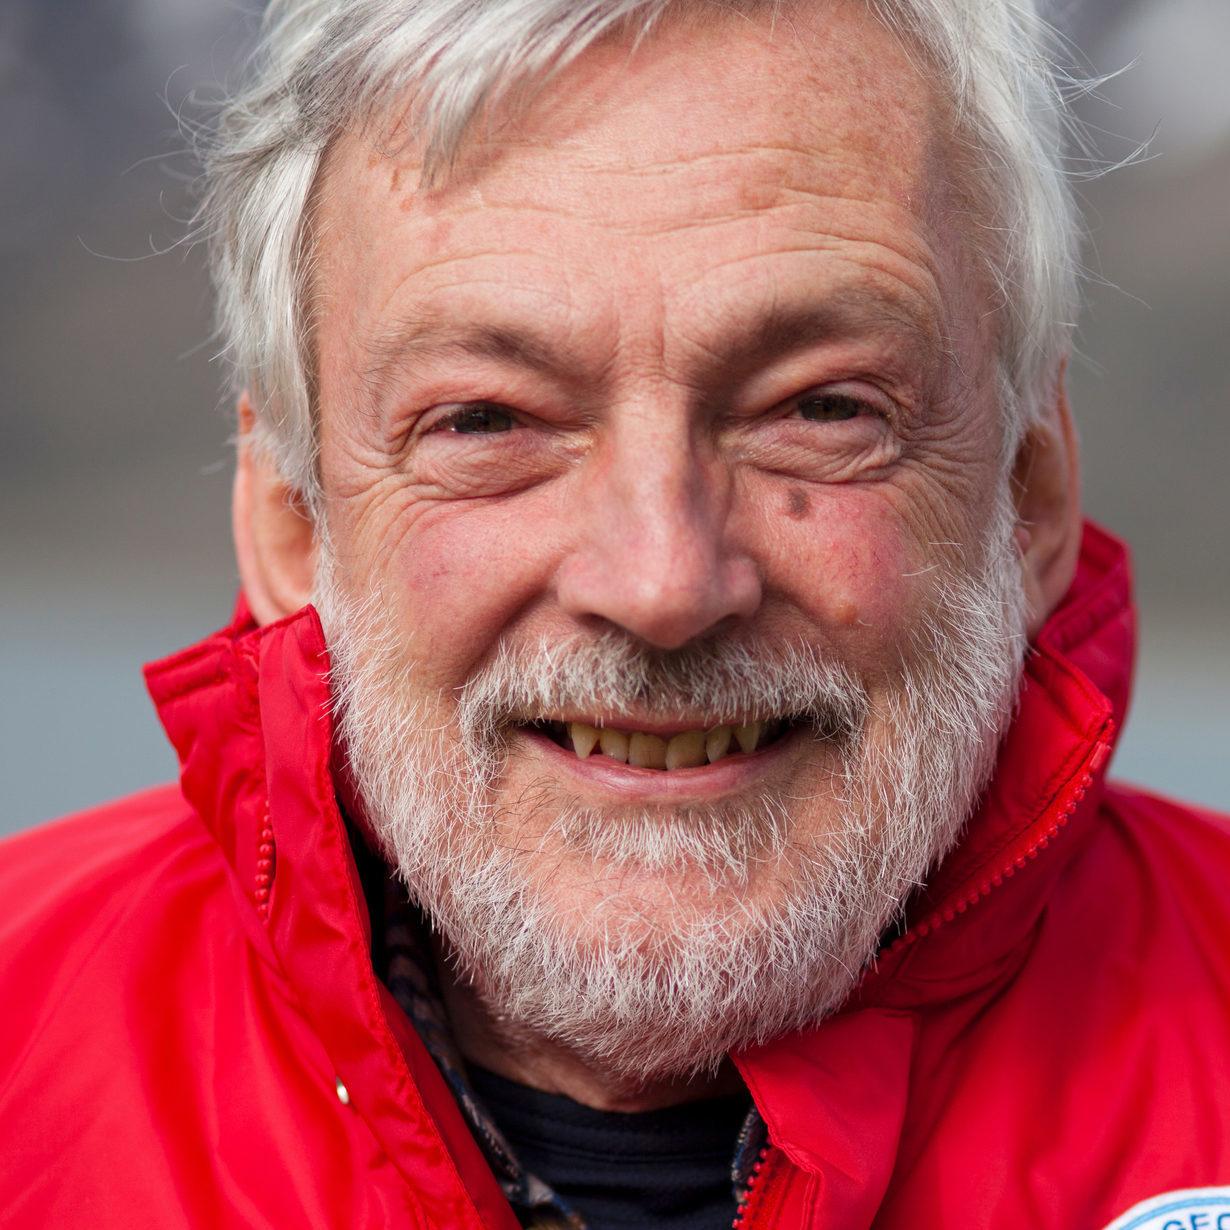 Peter Wadhams